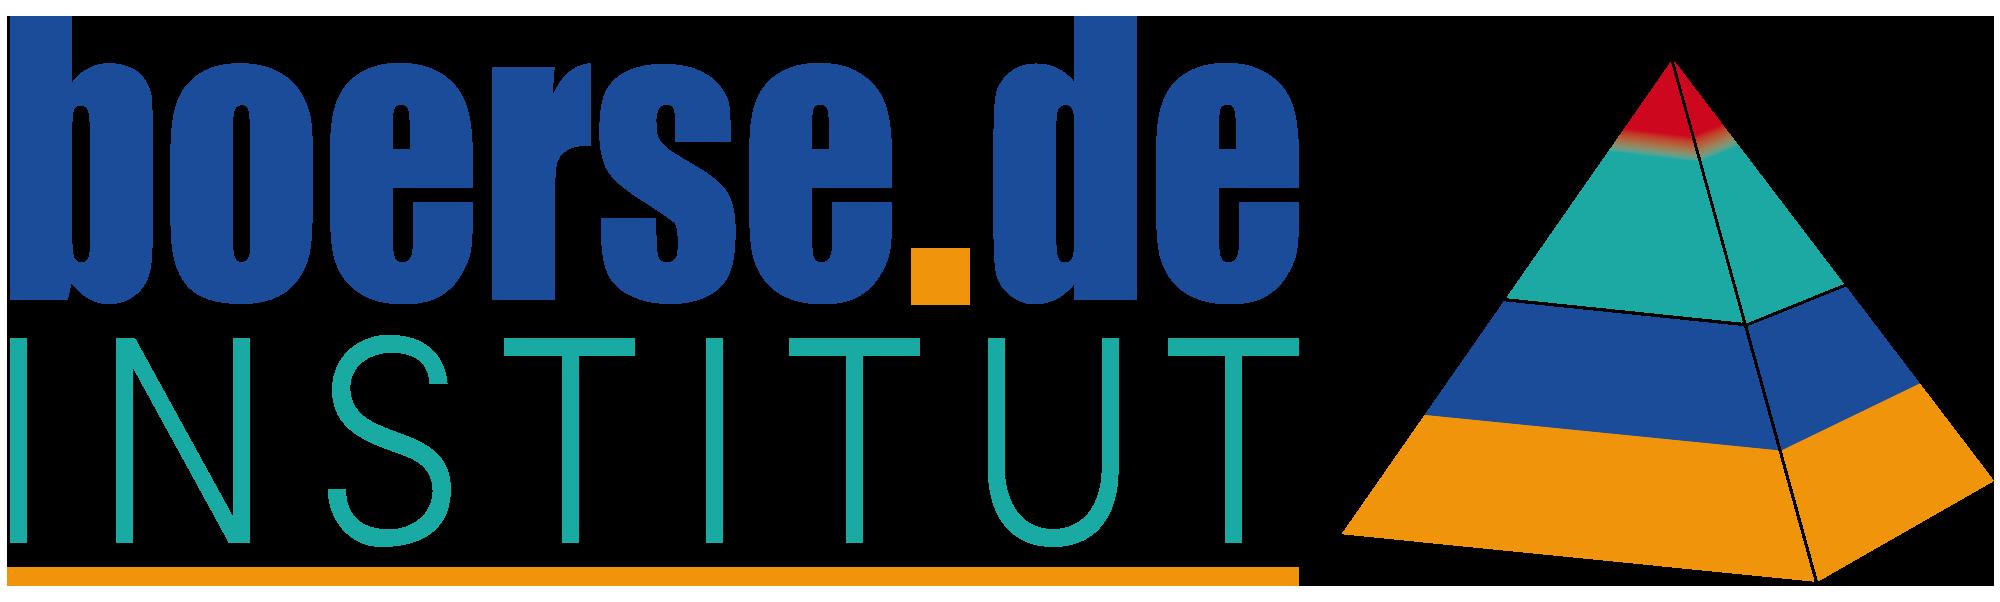 boerse.de Institut GmbH